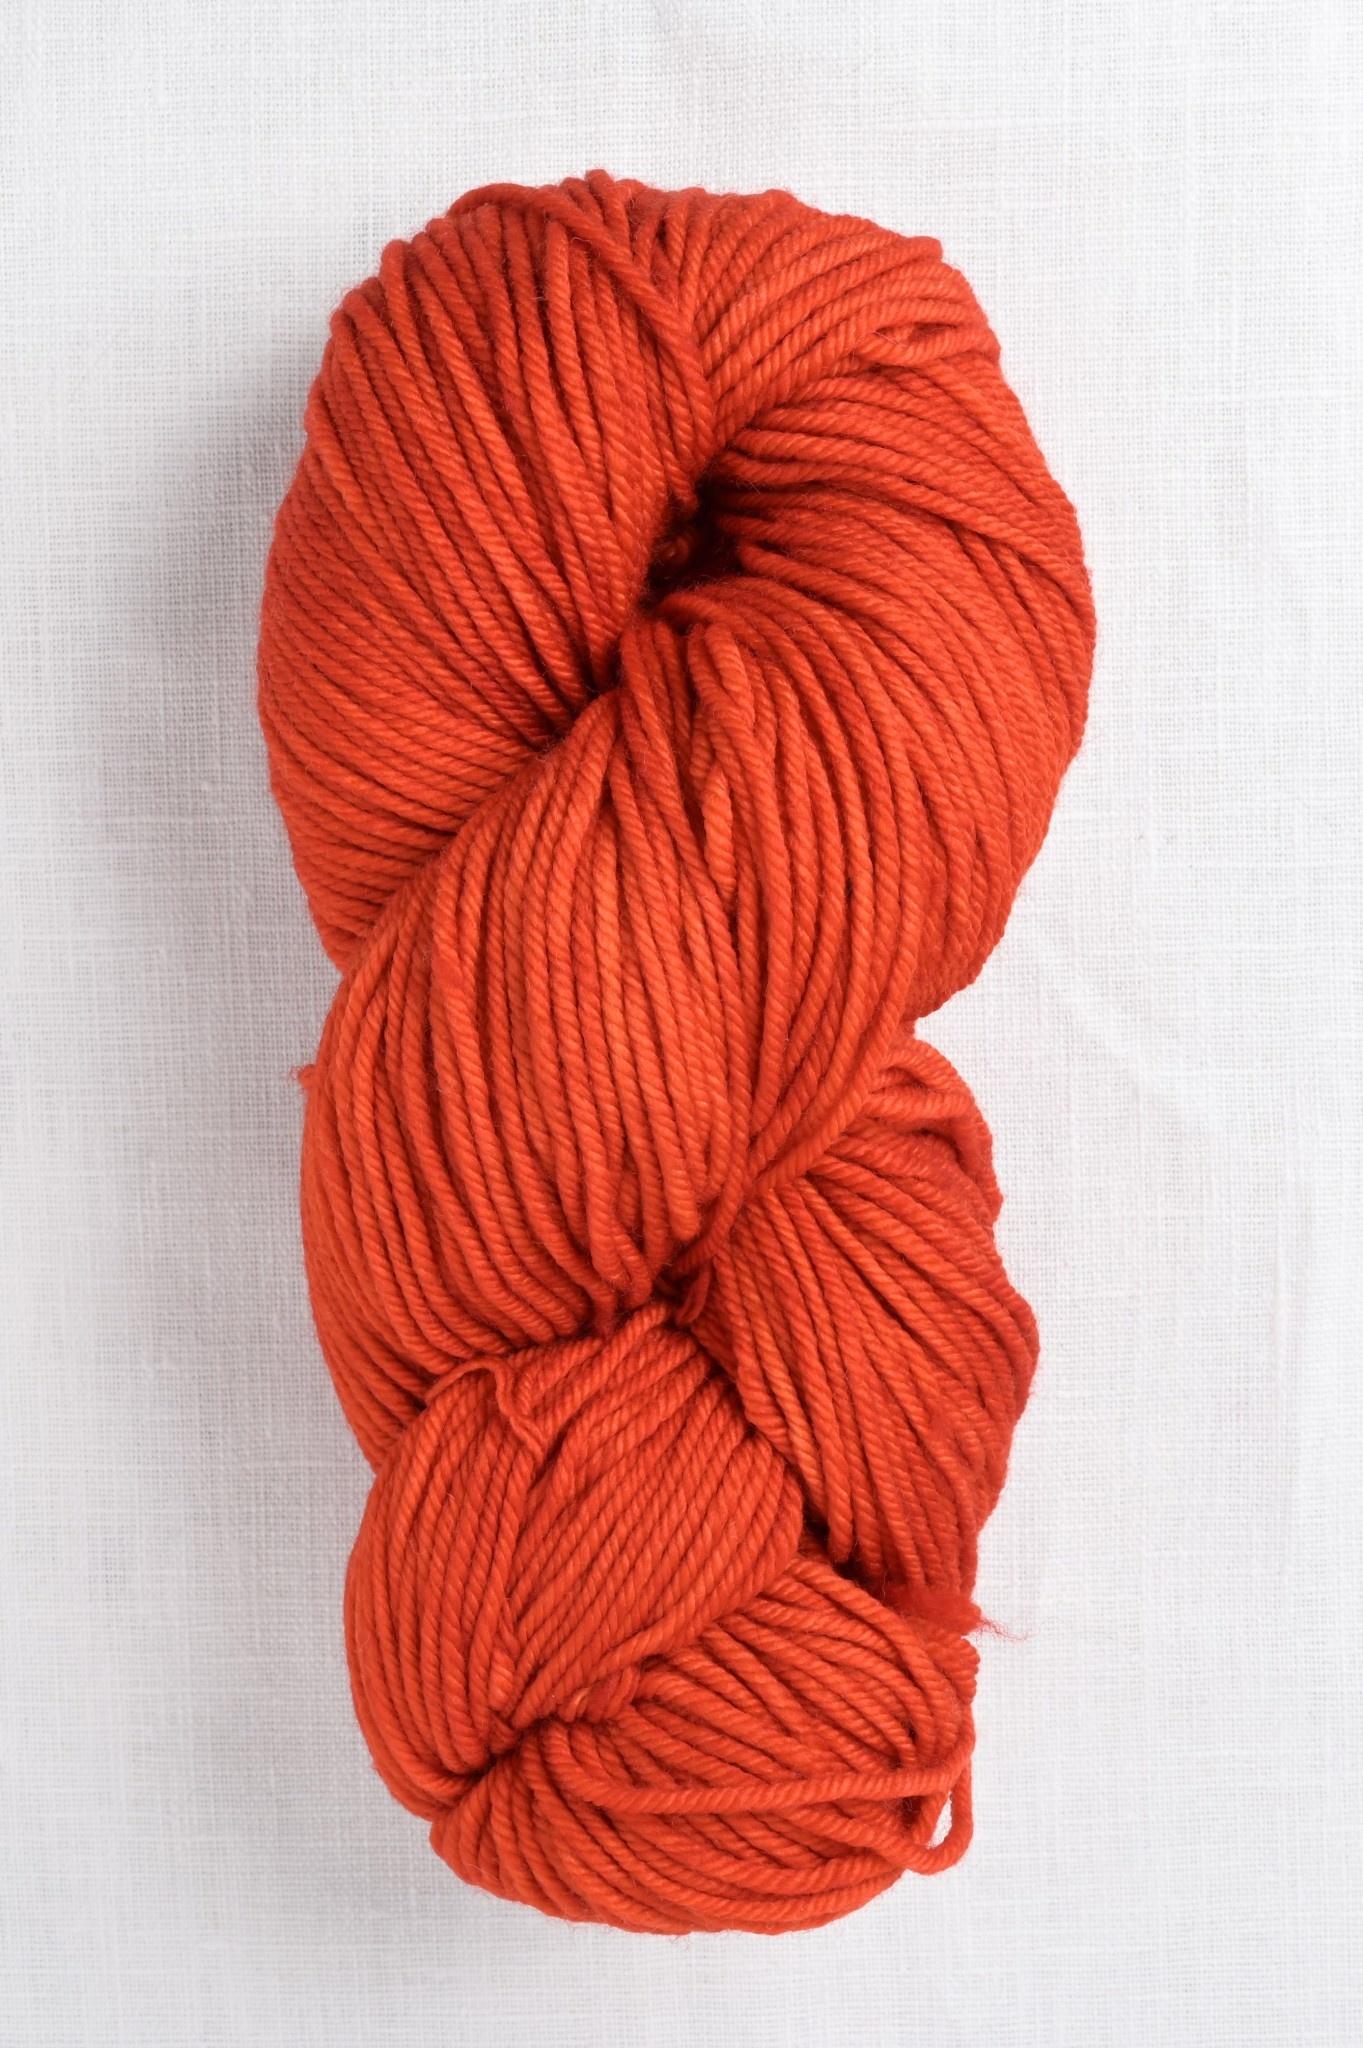 4 ply Worsted Weight Yarn Malabrigo Merino Wool Rios in Glazed Carrot